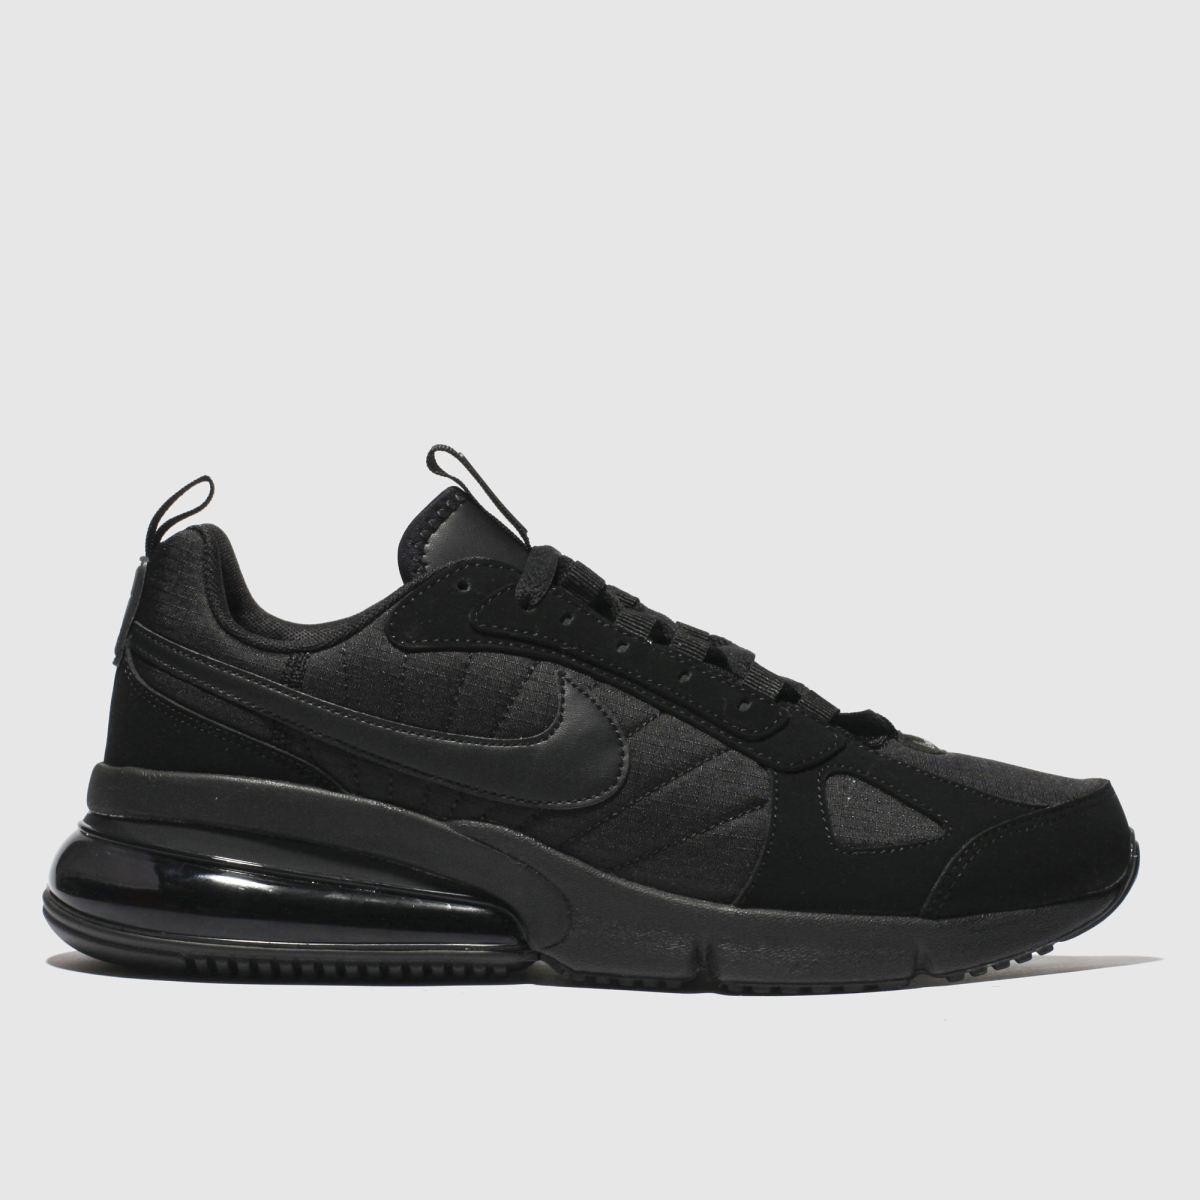 Nike Black Air Max 270 Futura Trainers